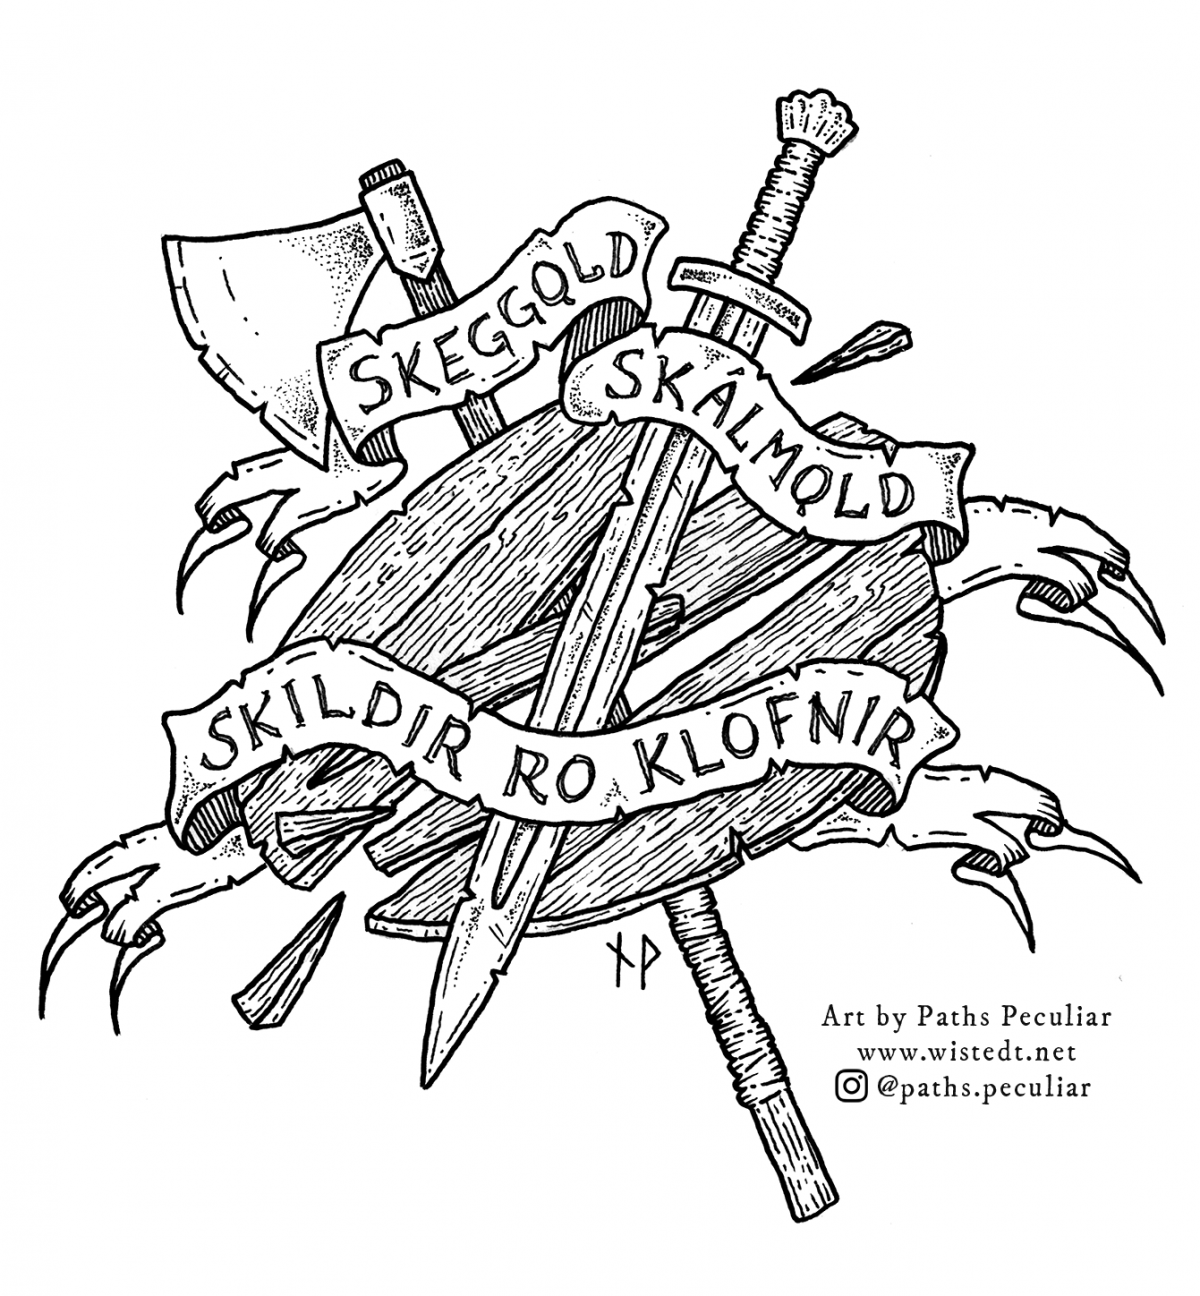 Axe, sword and splintered shield. Text reading: Skeggǫld, skálmǫld, skildir ro klofnir.